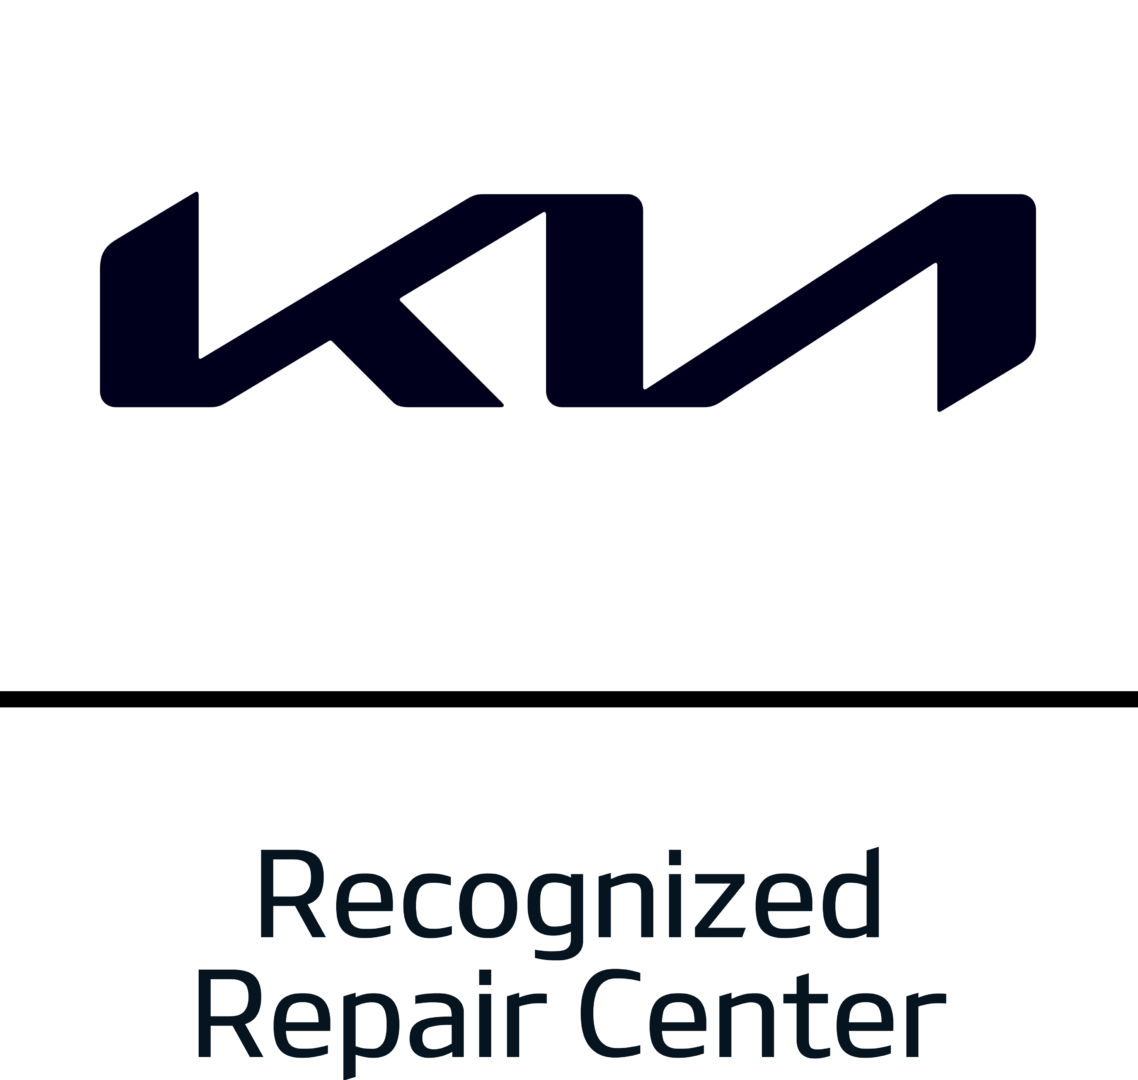 https://secureservercdn.net/104.238.68.196/m7t.e20.myftpupload.com/wp-content/uploads/2021/06/Kia2021-Recognized-Collision-Repair-Center-B-3.png